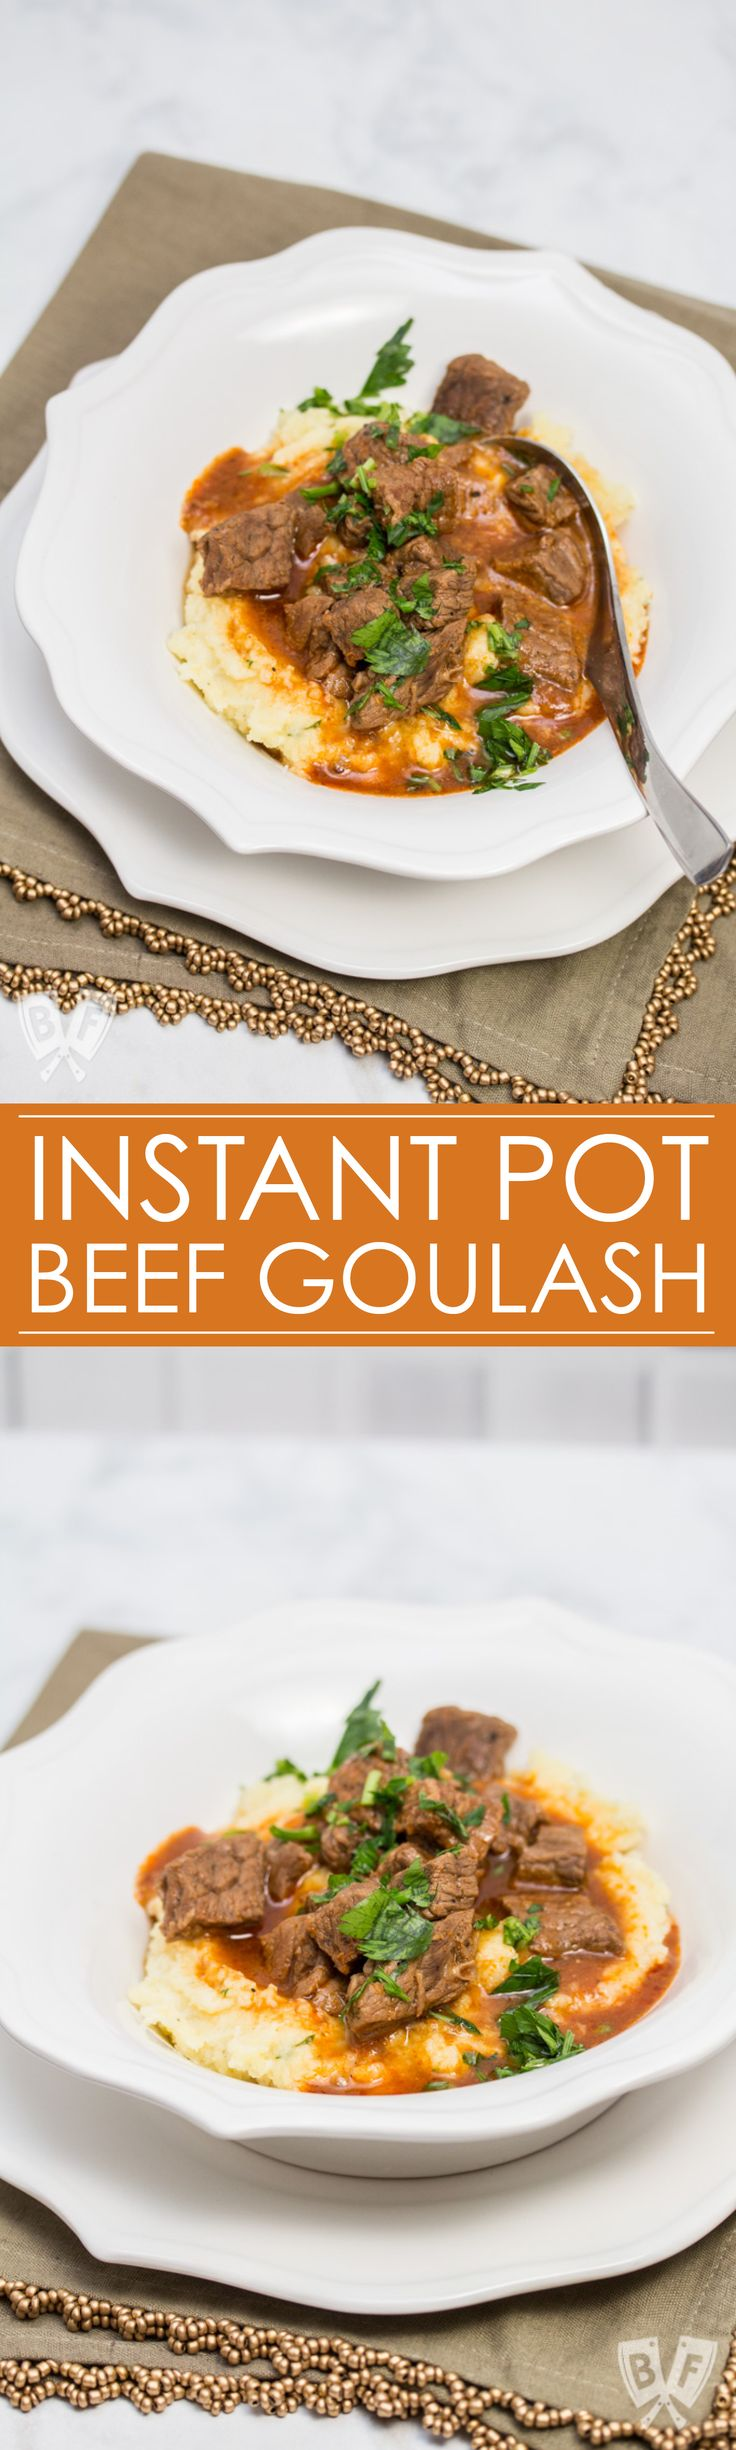 Instant Pot Beef Goulash